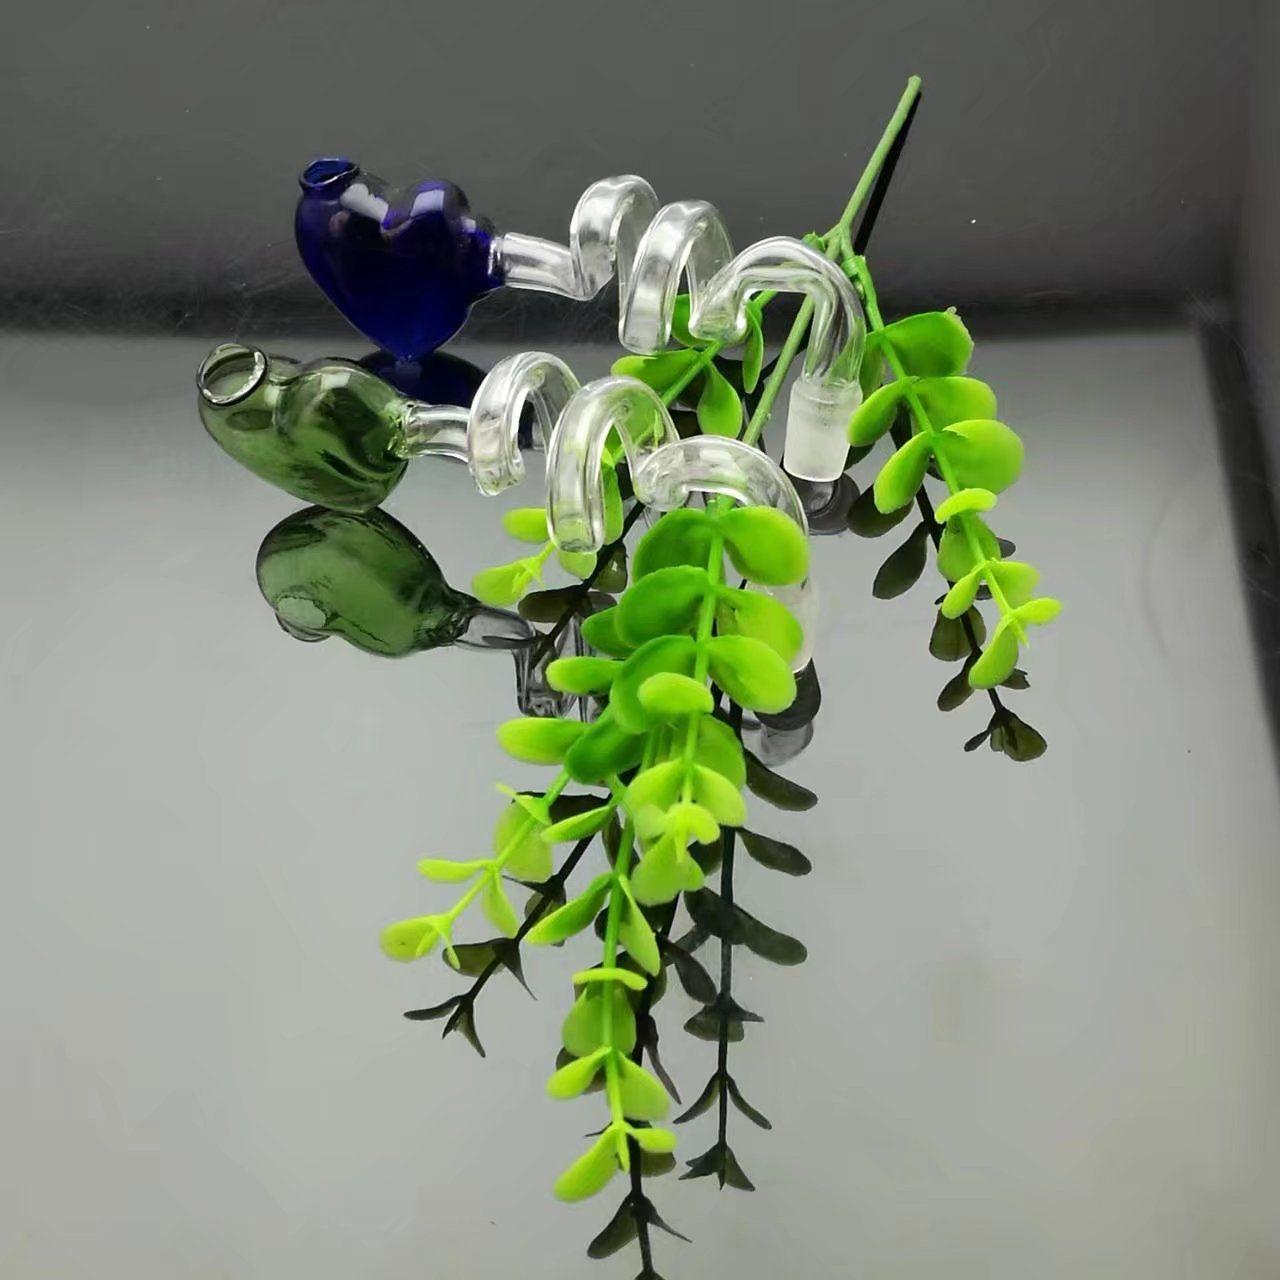 Espiral de color pote de melocotón bongs de cristal al por mayor Tubos de quemador de aceite Tuberías de agua Tubería de vidrio Plataformas de aceite que fuman Envío libre